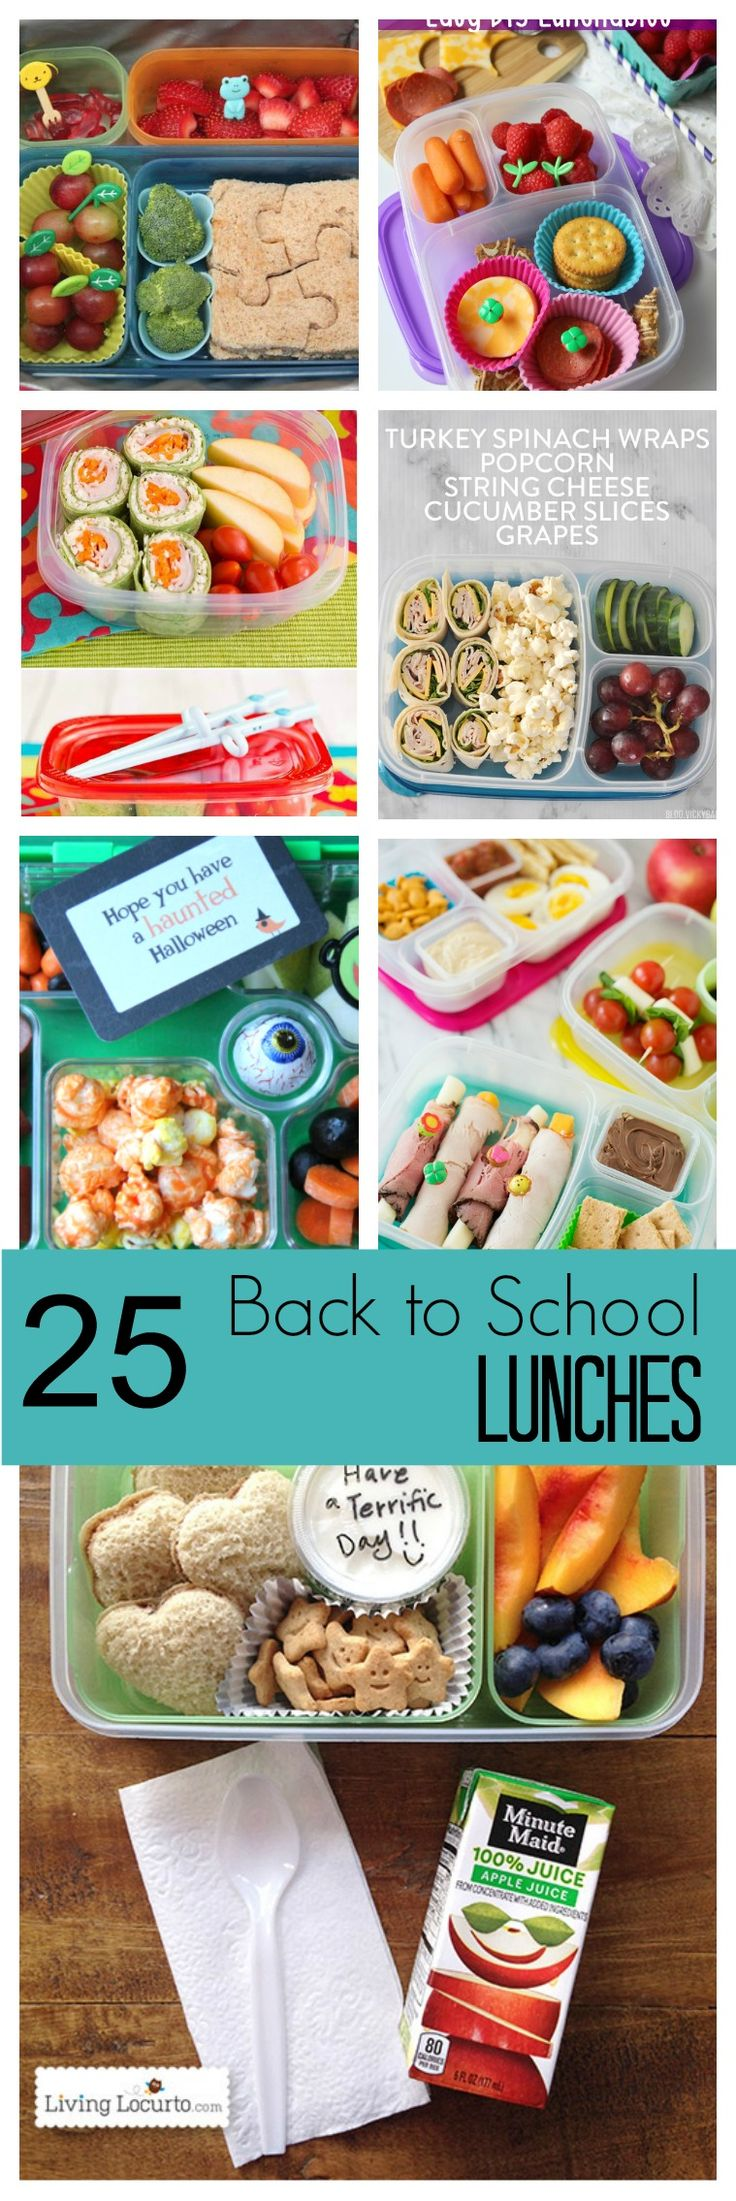 25 Back to School Lunch Box Ideas Kids Will Love | http://www.foodlovinfamily.com/25-back-to-school-lunch-box-ideas-kids-will-love/